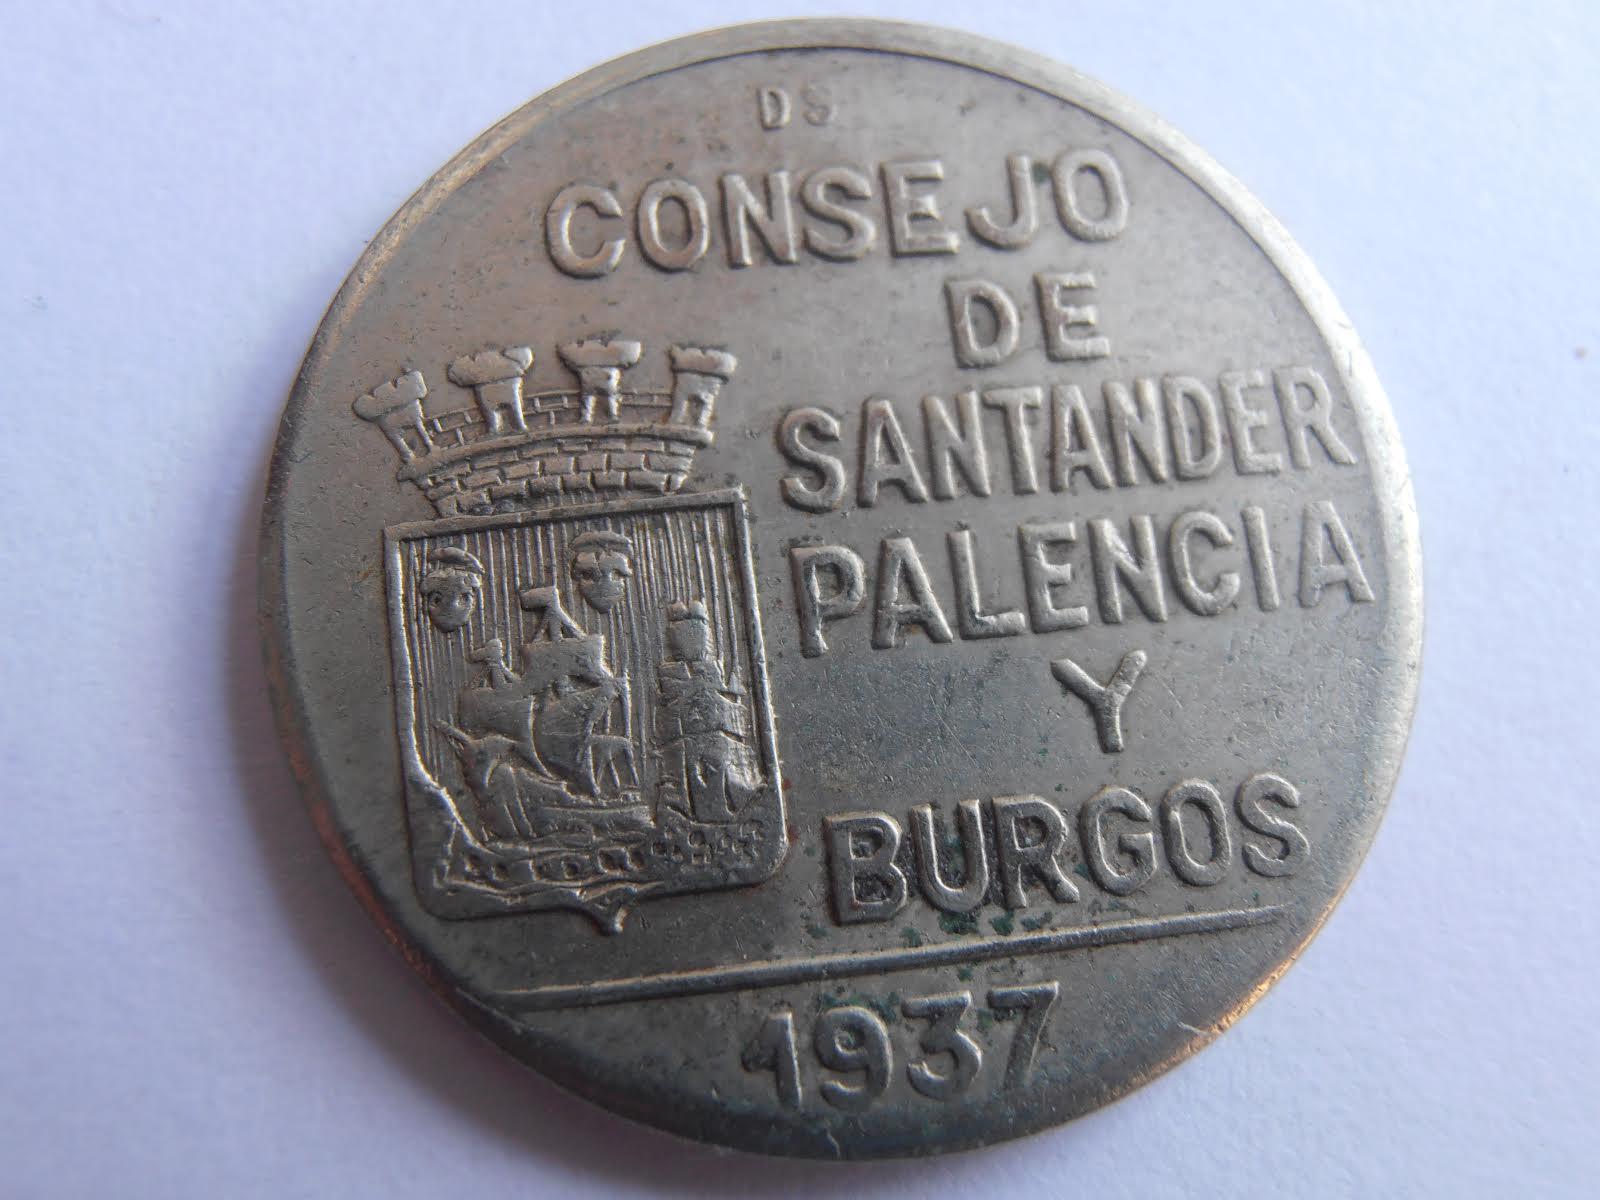 1 Peseta 1937. II República - Consejo Santander Palencia Burgos Ic5v6b